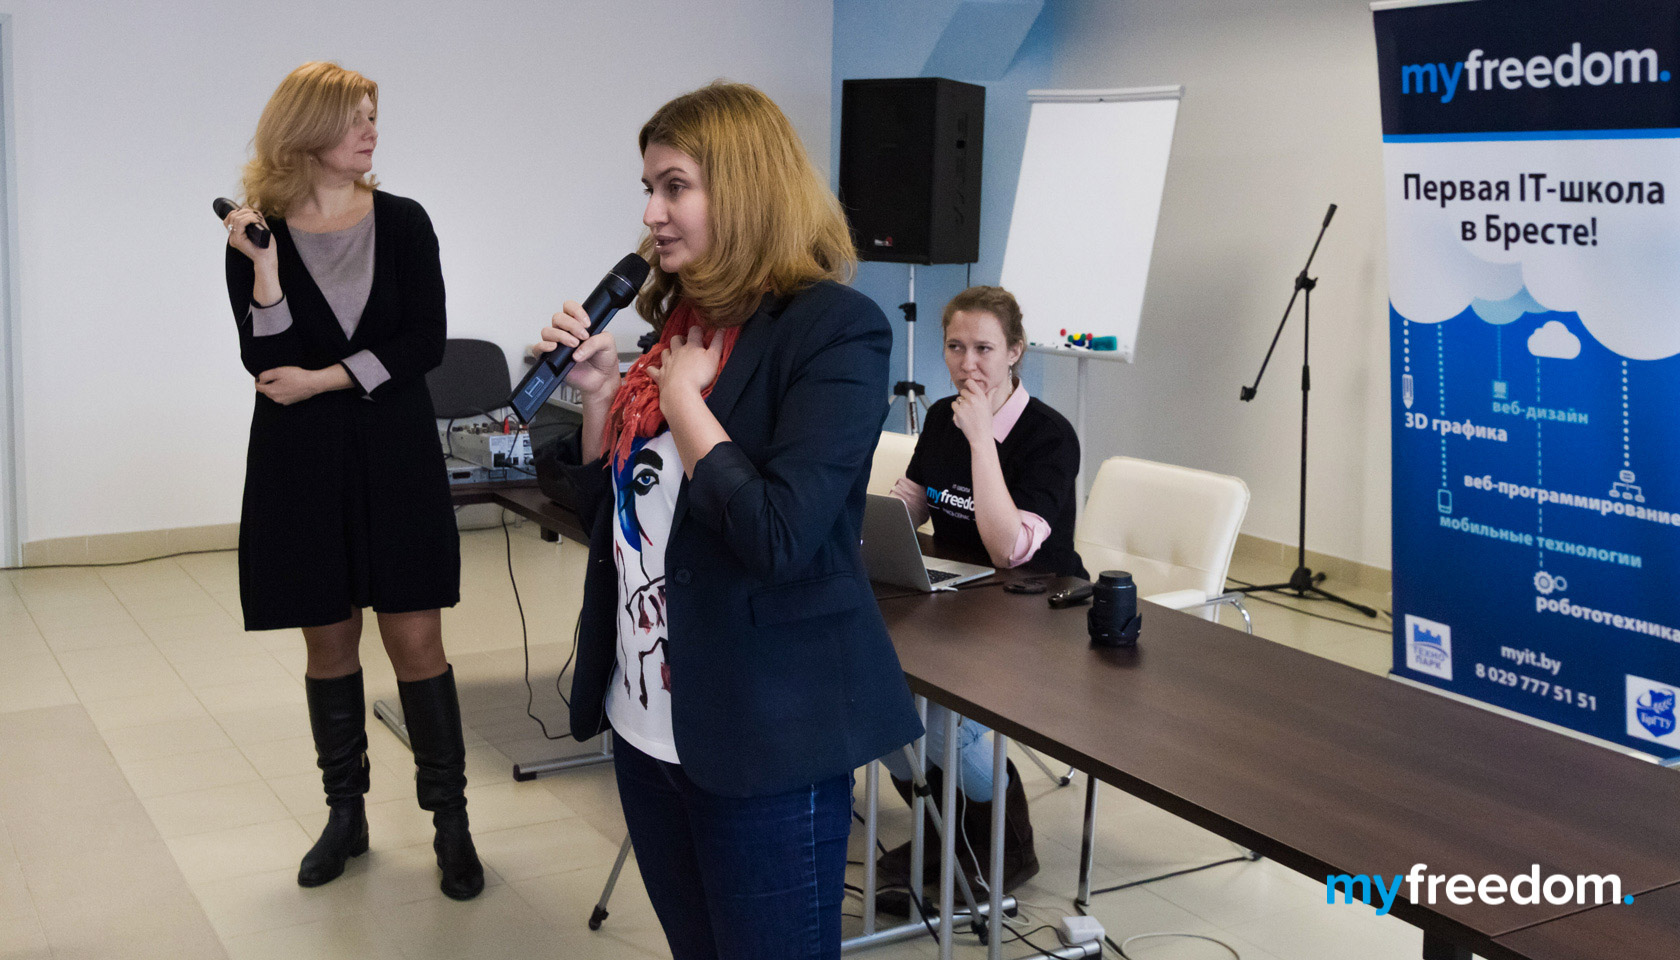 Первая в Бресте IT-школа Myfreedom. Елена Динман и Генриетта Венчик на конференции Pro.IT